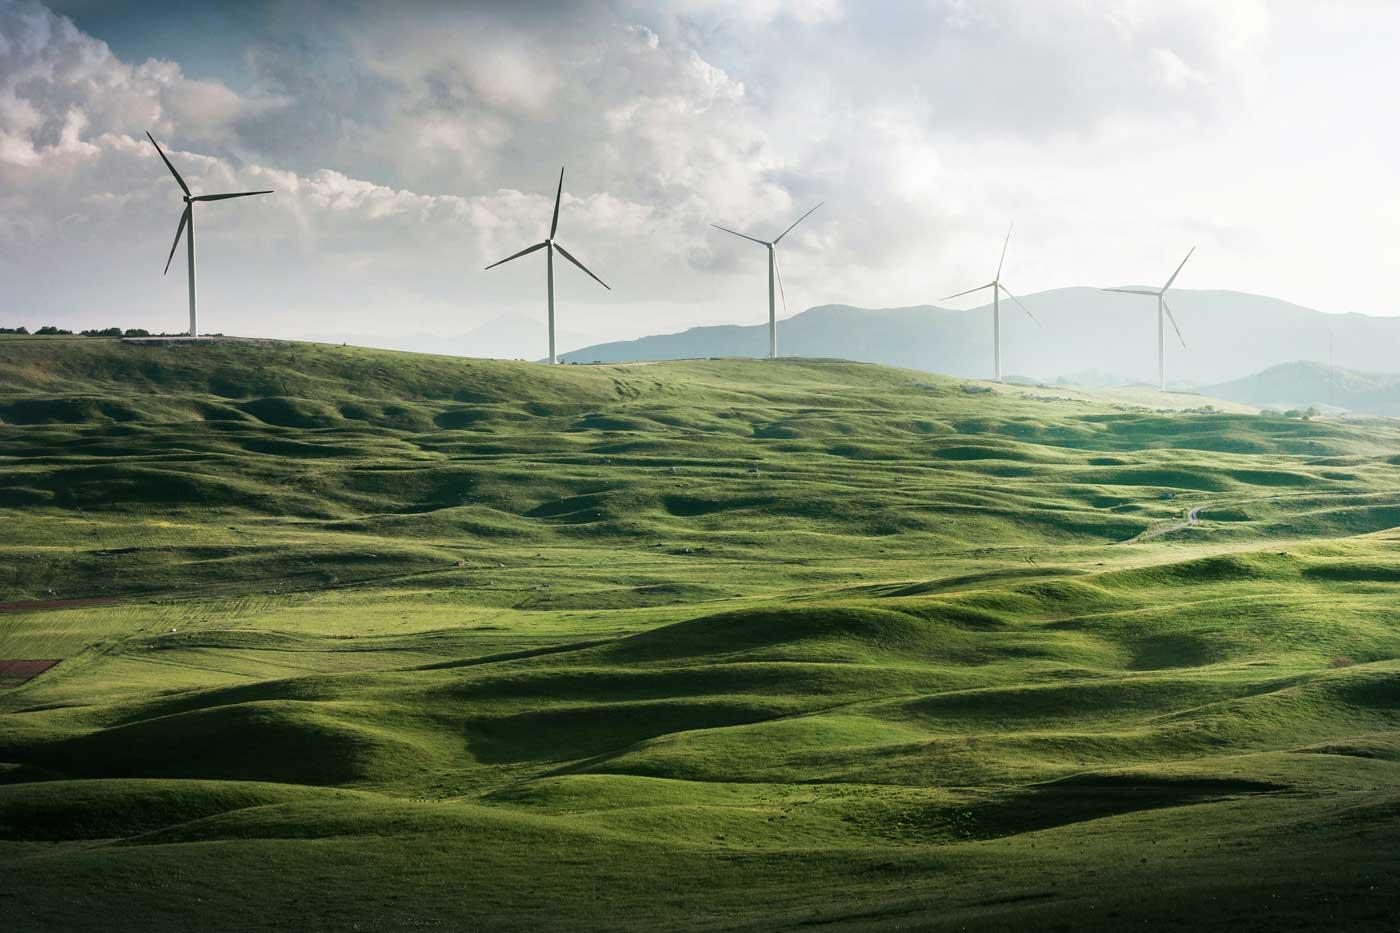 Windräder erzeugen erneuerbare Energien